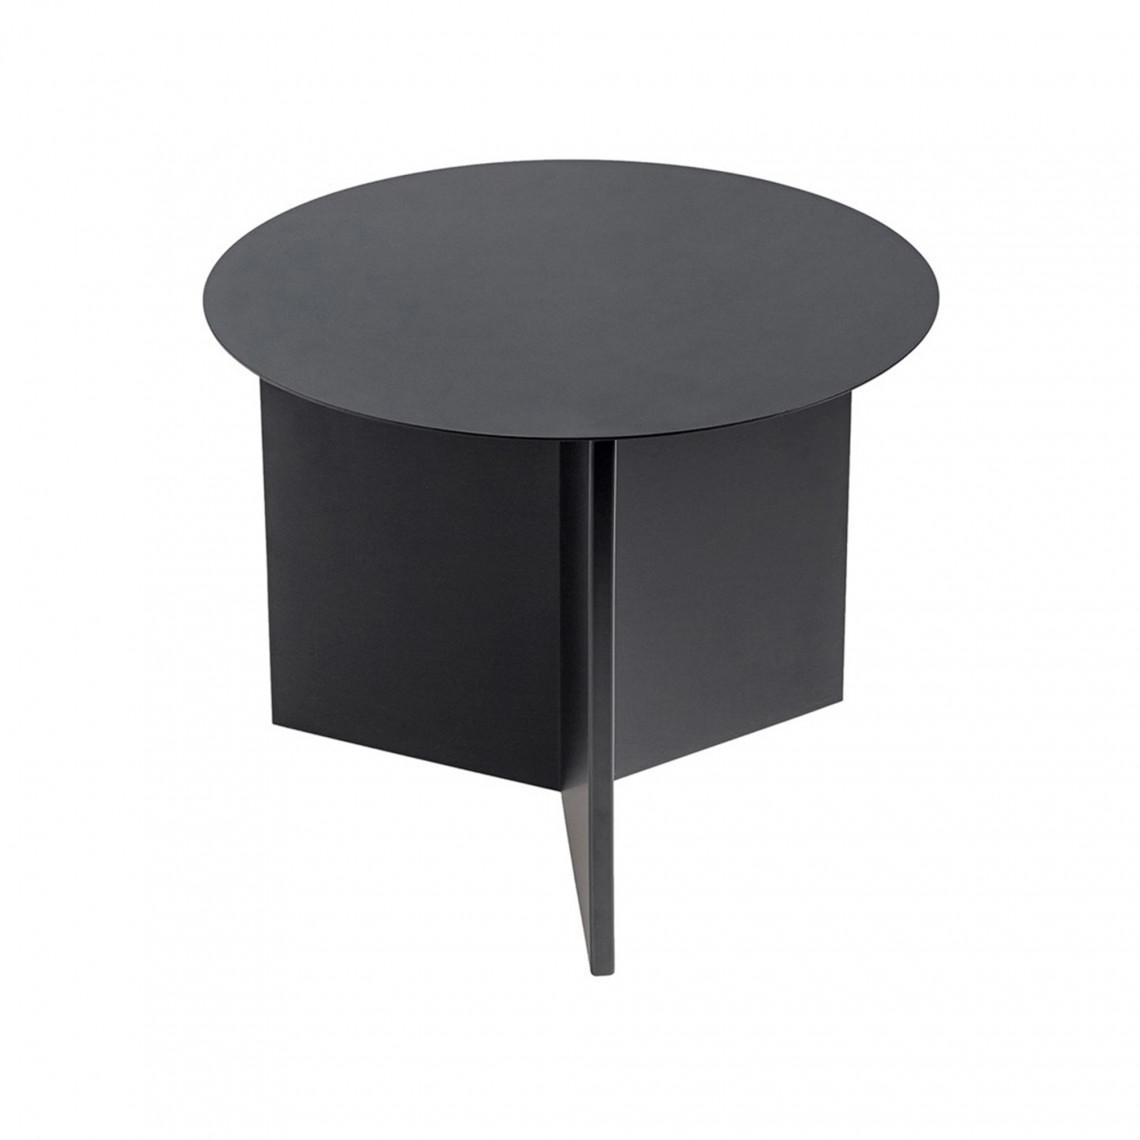 Slit Table Round